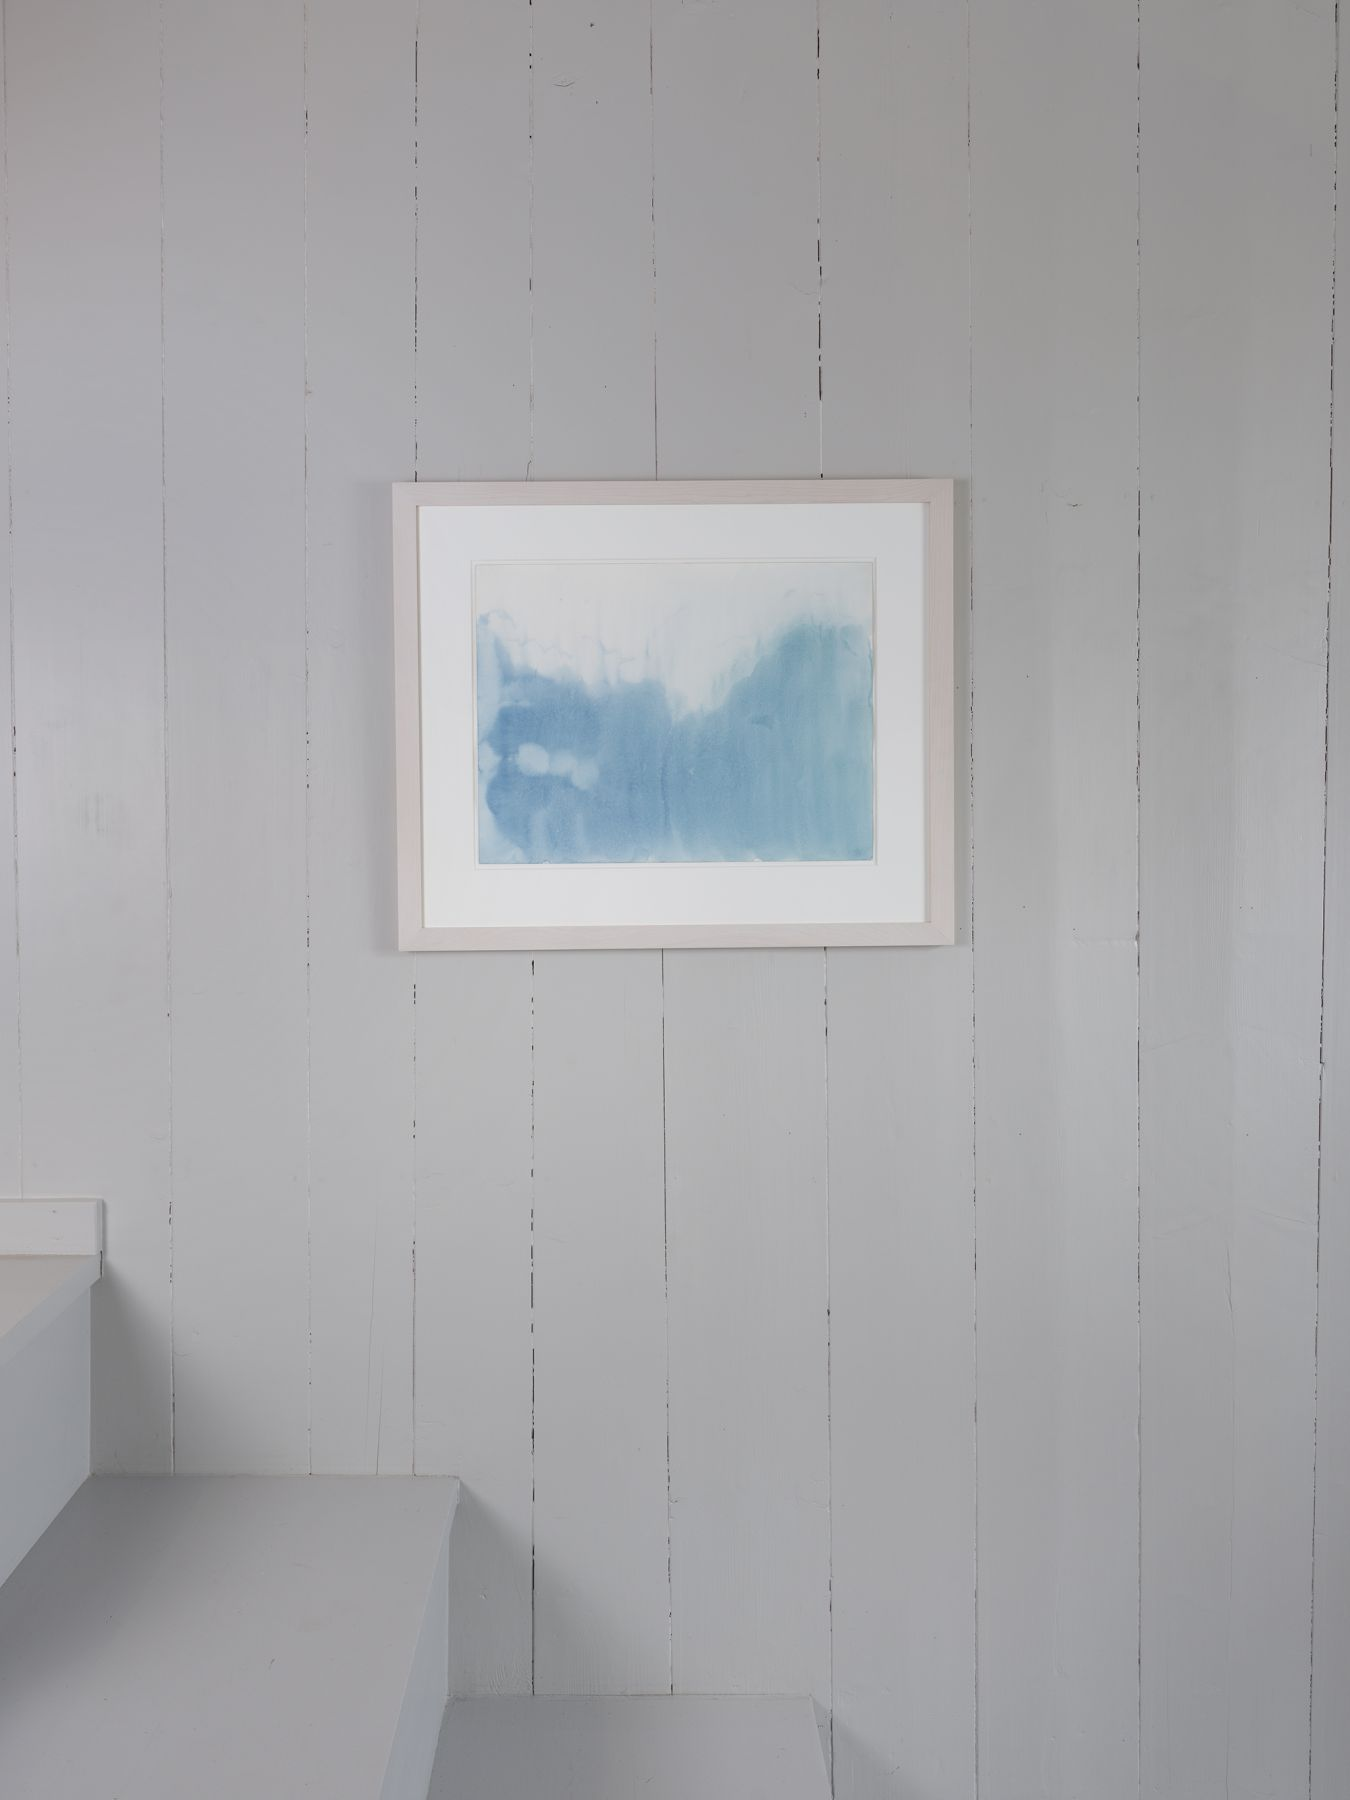 Markus Döbeli  Untitled, 2015  Watercolor on paper  46 x 61 cm installation view